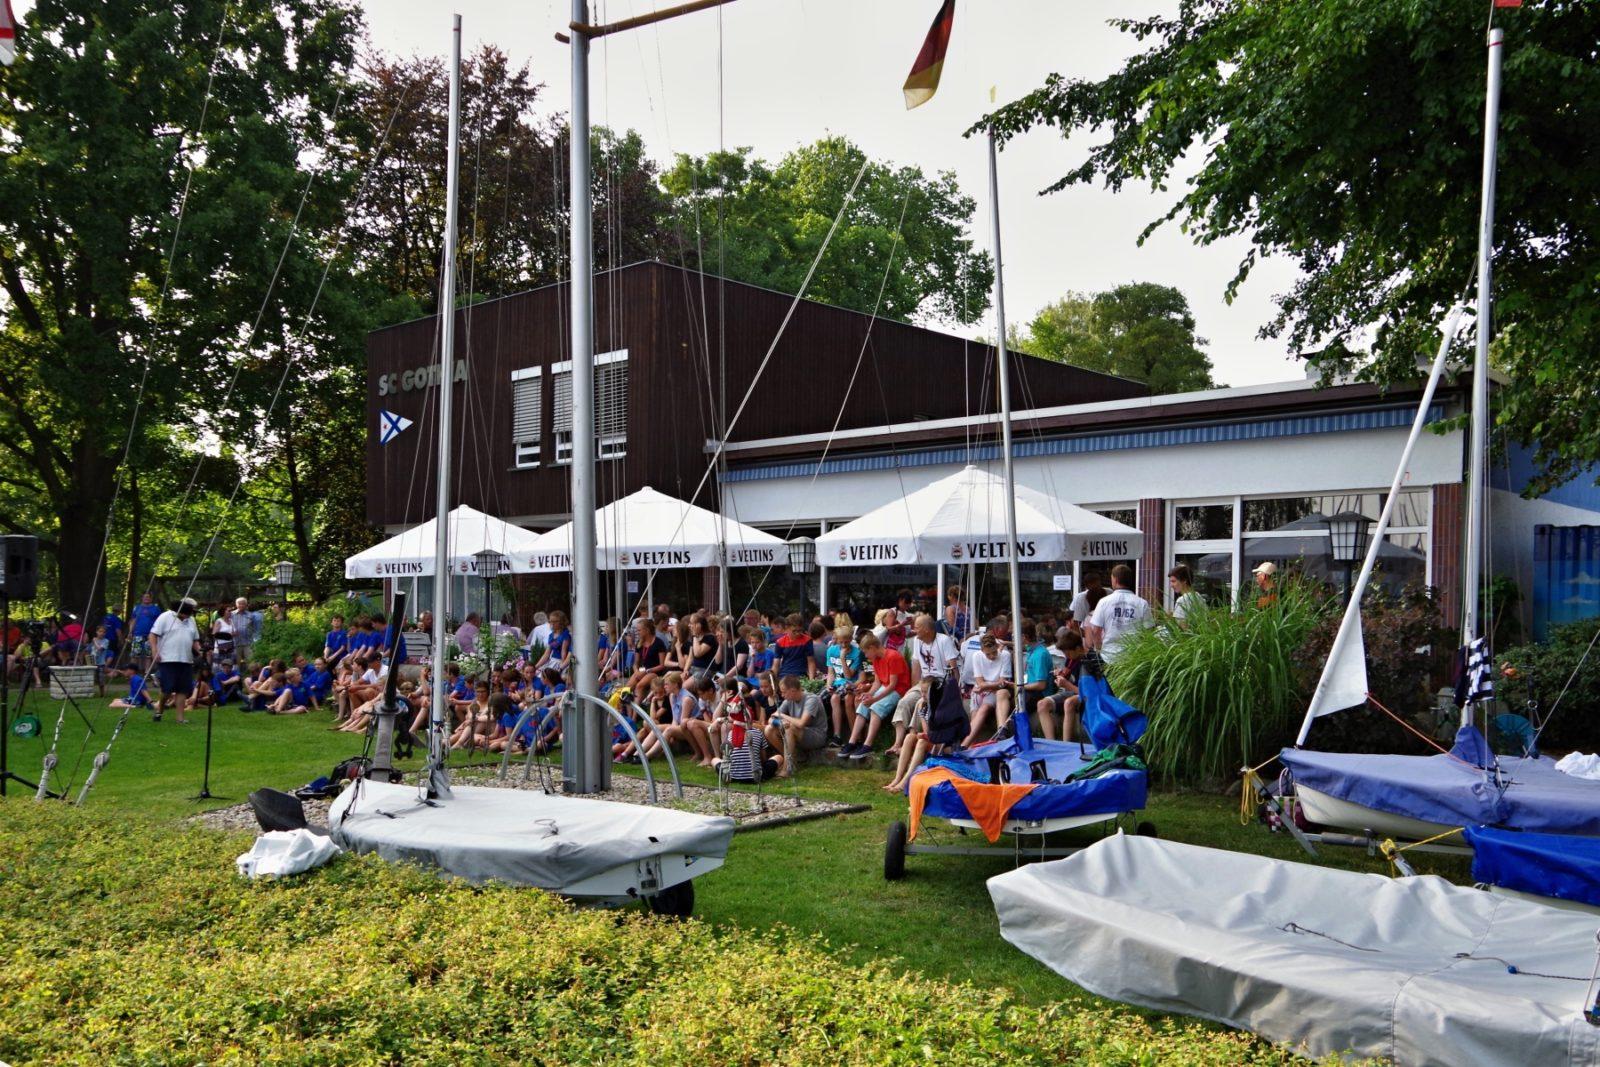 IDJüM 2016 im Teeny im Segler-Club Gothia e.V. in Berlin, 24.07.2016 - Eröffnung der Meisterschaft - Photo © SailingAnarchy.de